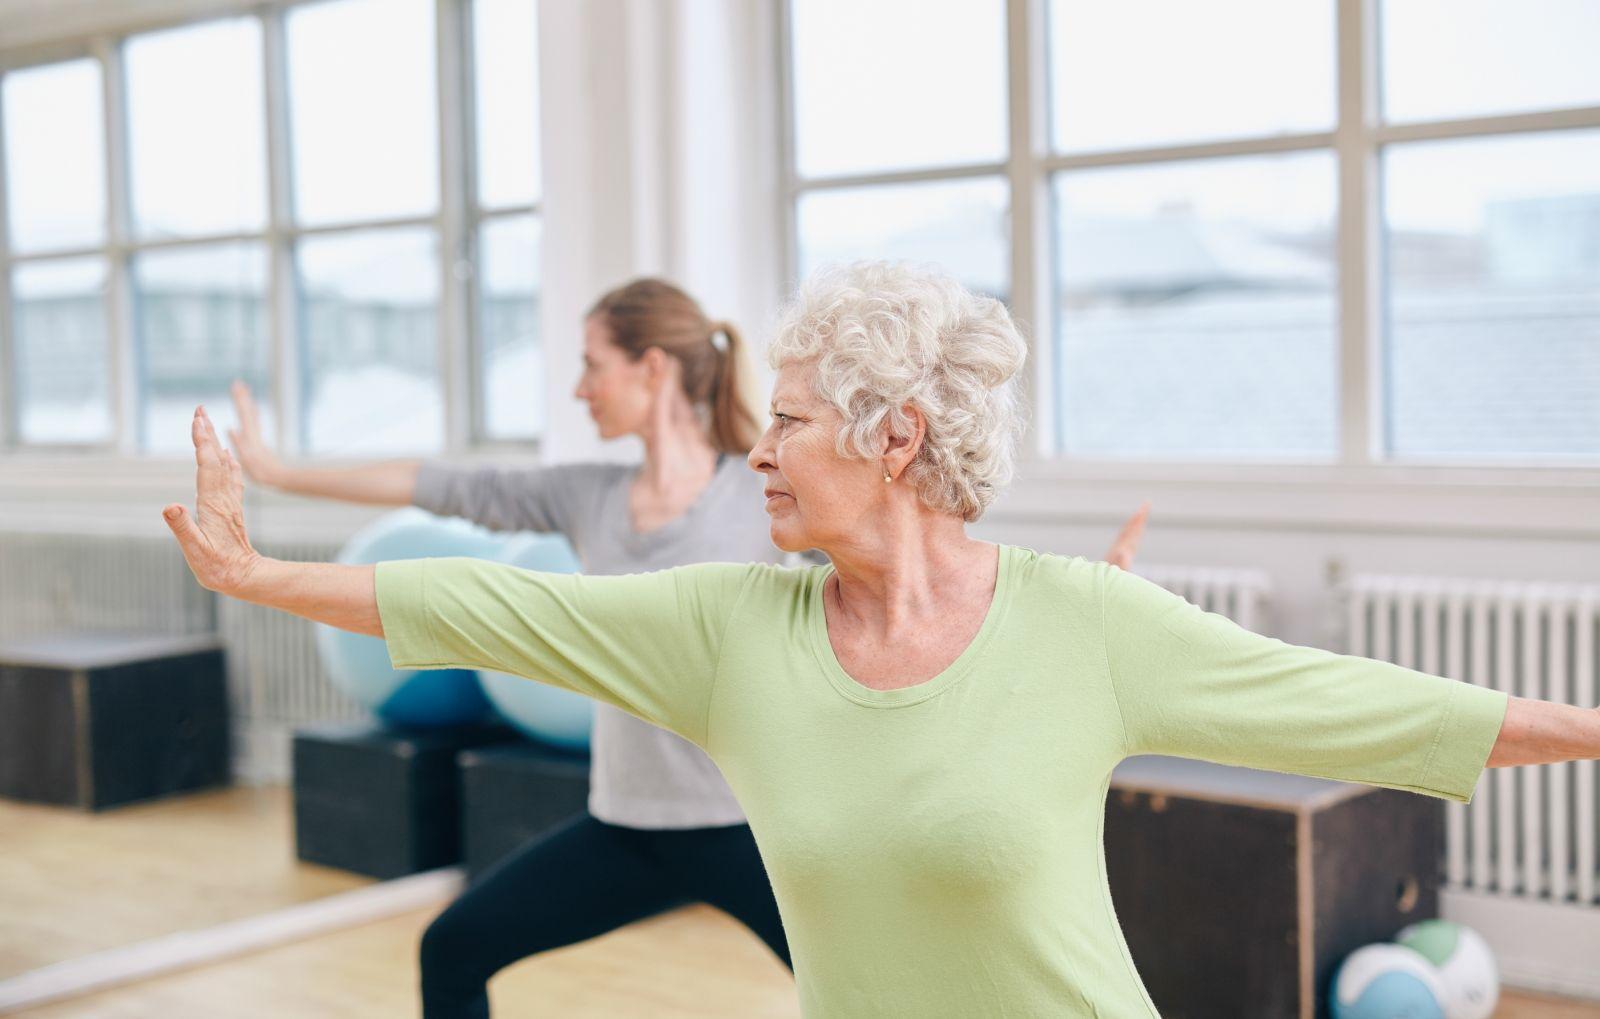 https://d2ebzu6go672f3.cloudfront.net/media/content/images/bigstock-Two-Women-Doing-Yoga-Workout-A-76765064.jpg?width=600